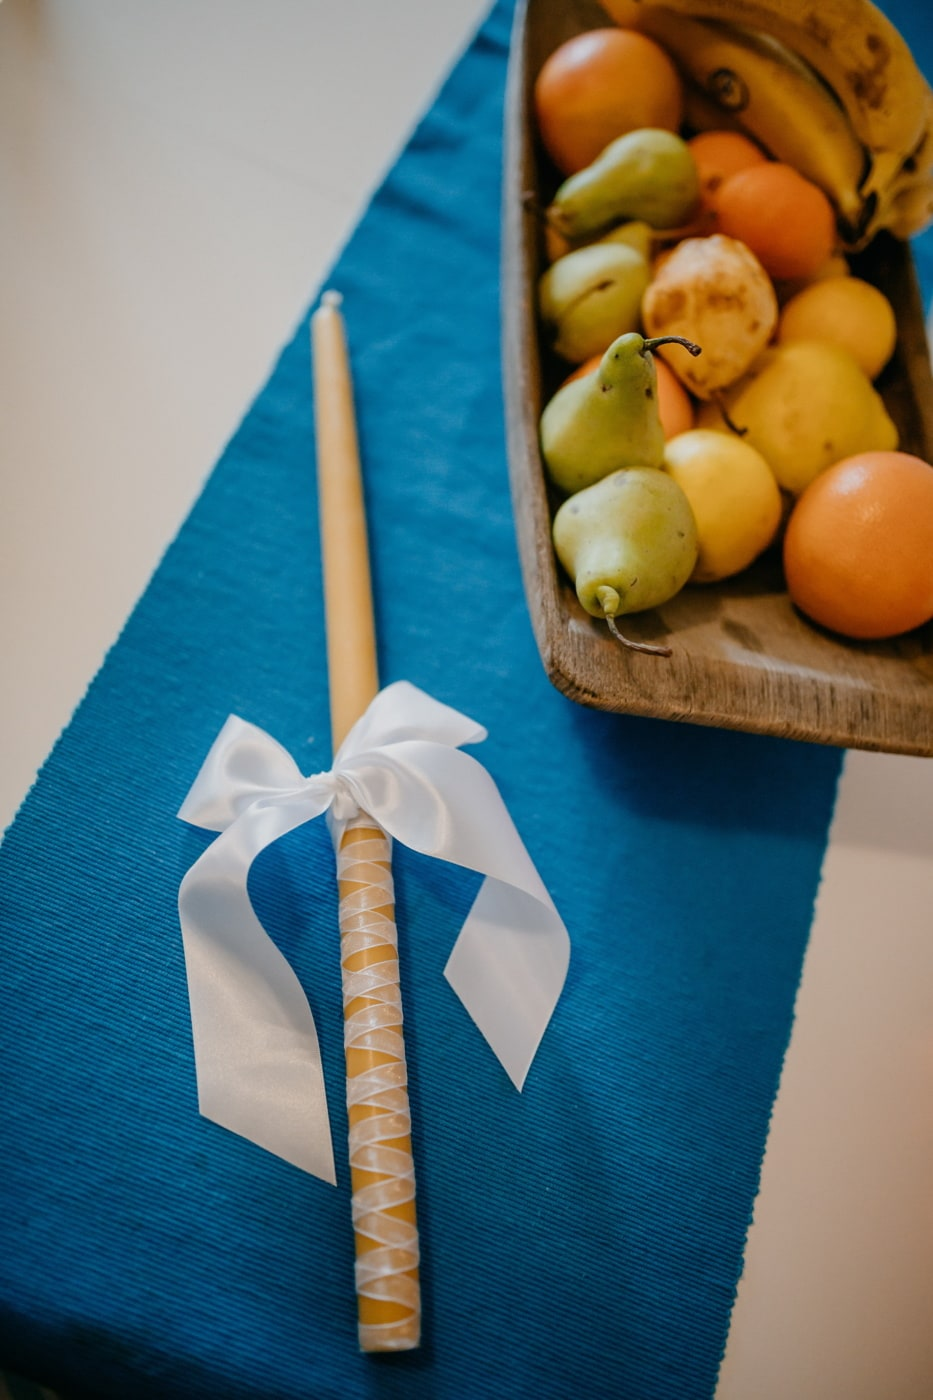 candle, yellowish, decoration, ribbon, banana, bowl, mandarin, pears, fruit, fresh